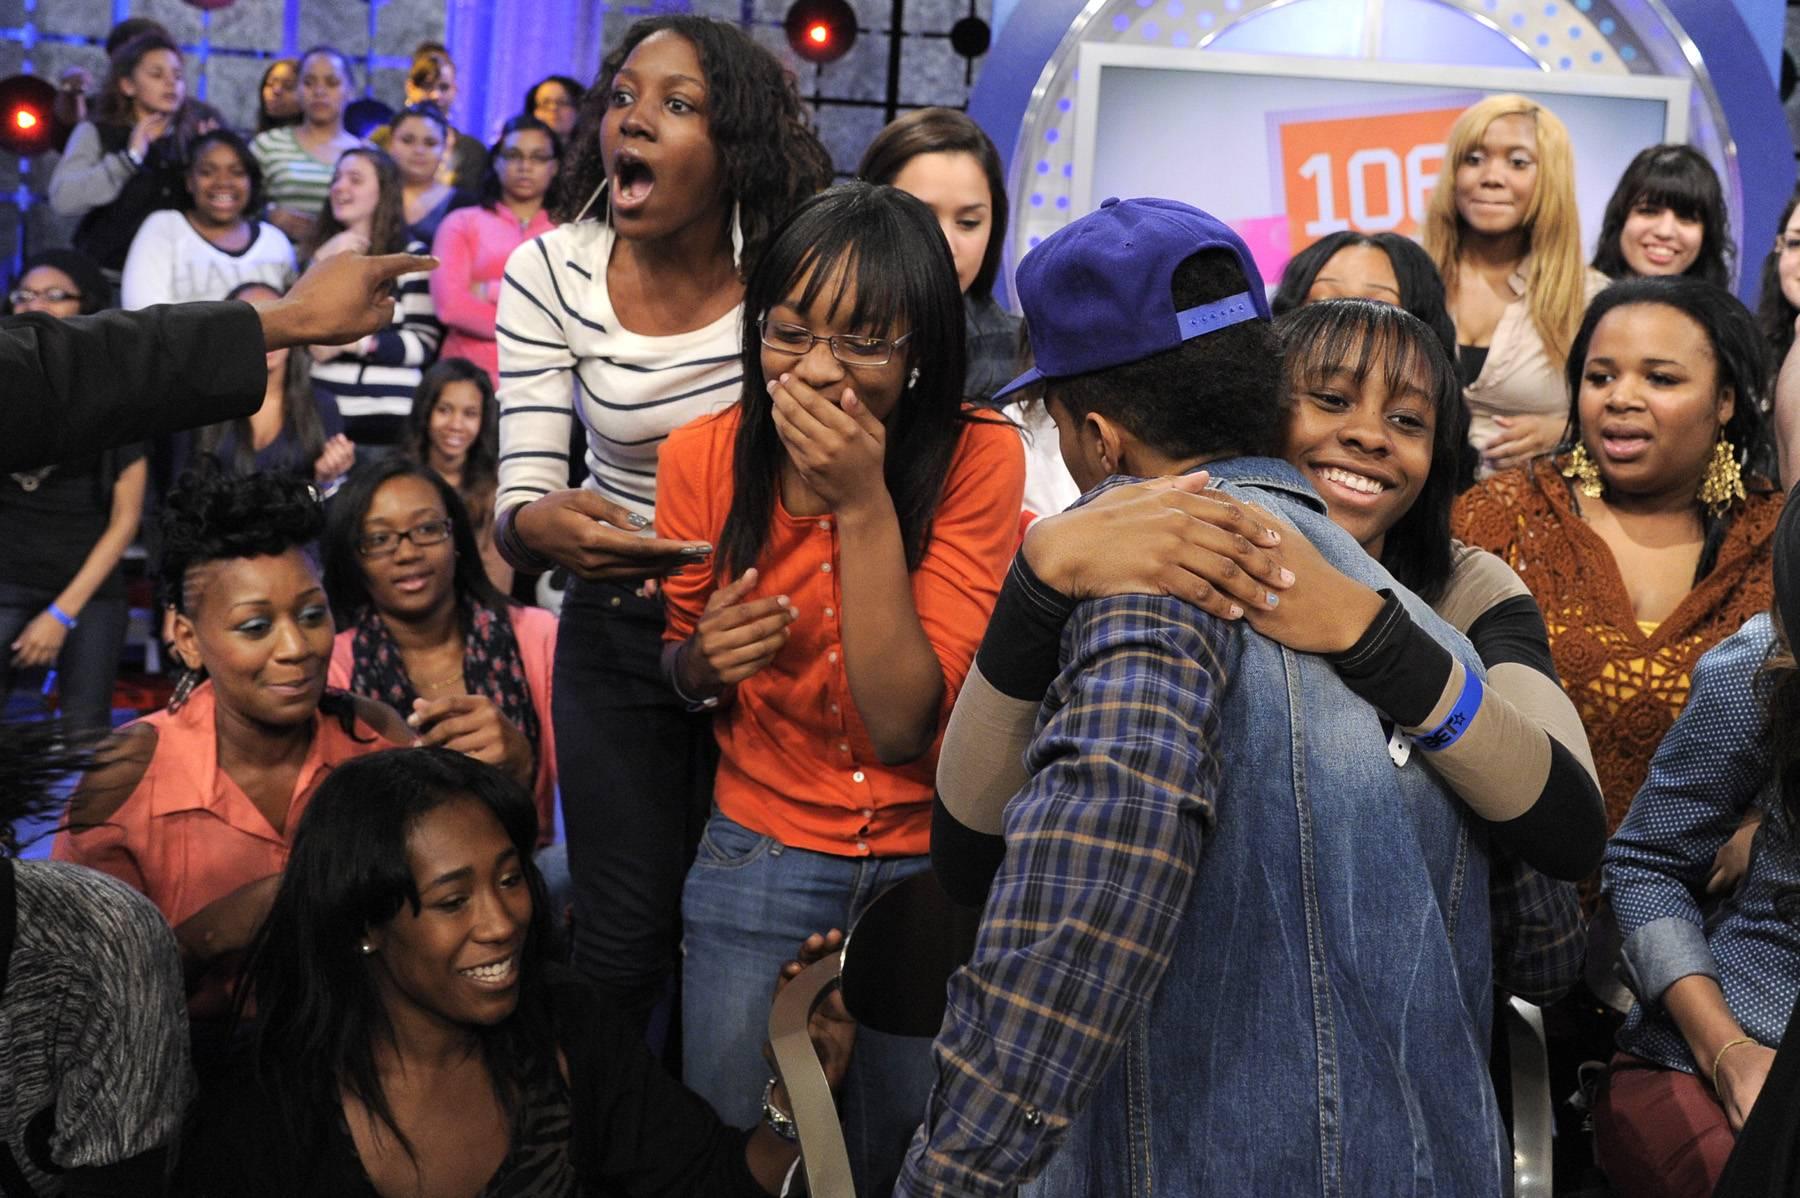 Love You - Bow Wow, aka Mr. 106 & Park greets fans at 106 & Park, January 23, 2012. (Photo: John Ricard / BET)